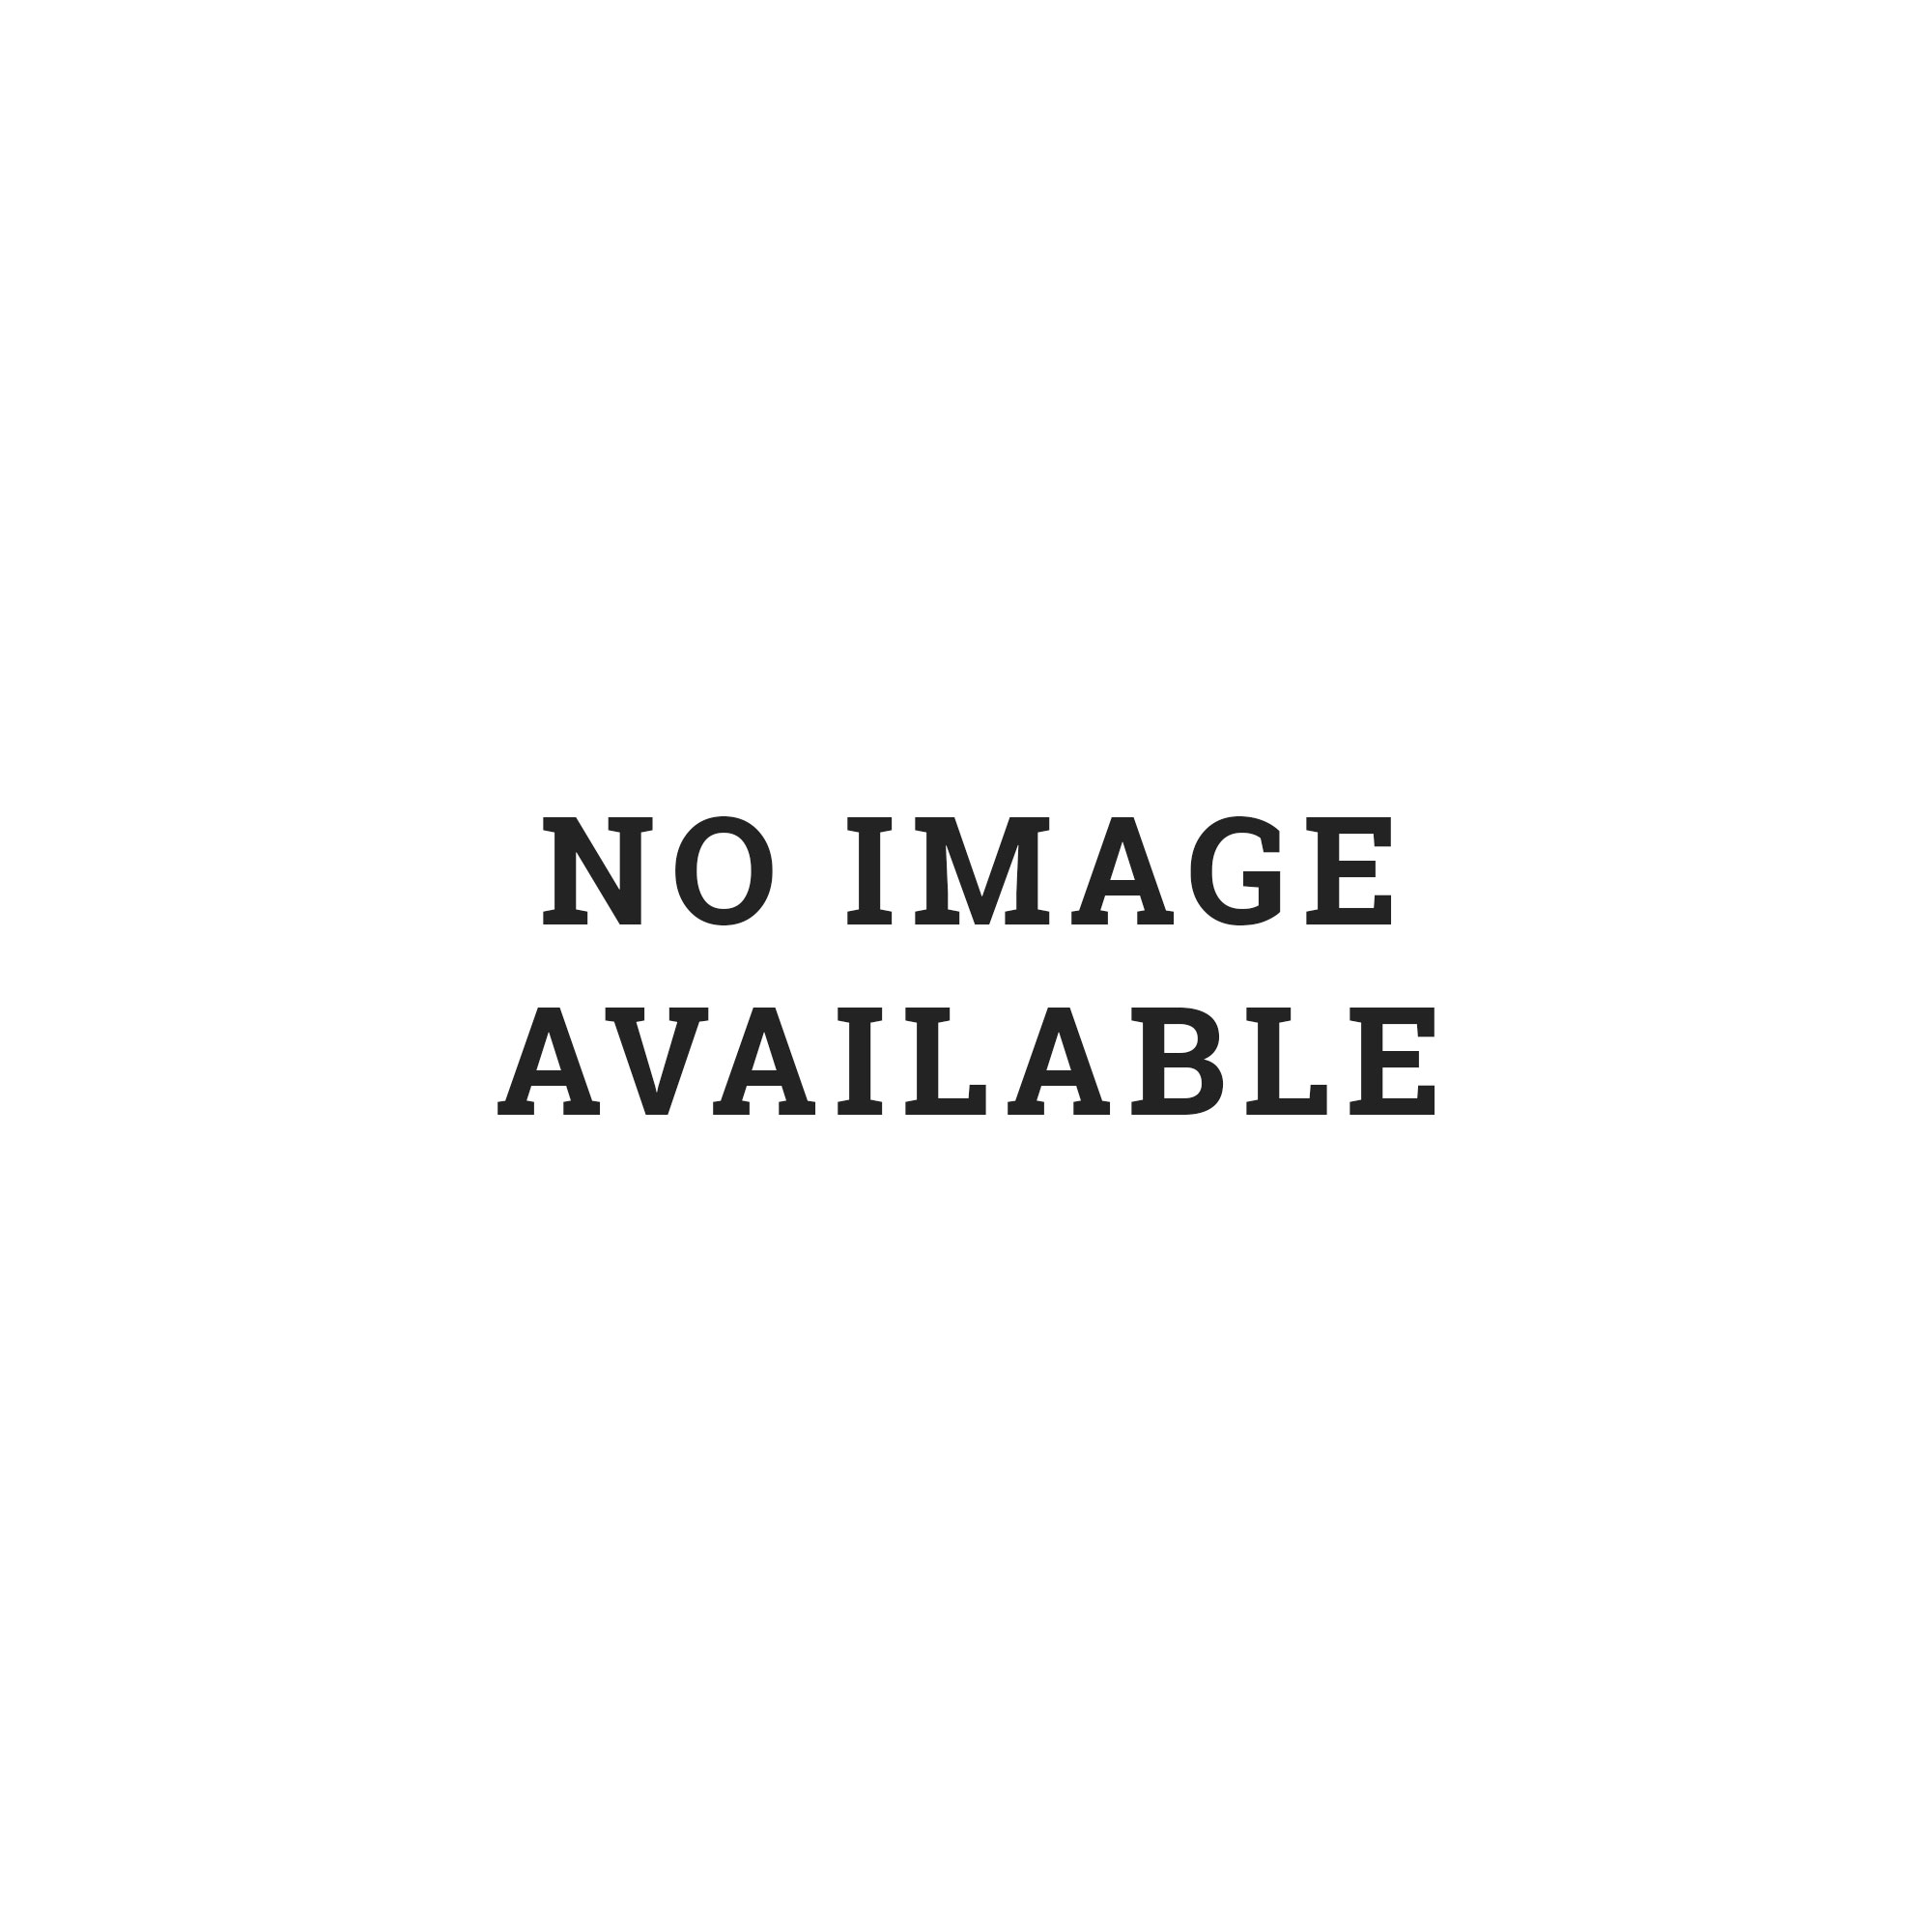 Vans VN0004PAIJU Sk8-Hi Lite Unisex Suede Skate Shoes - Black & White